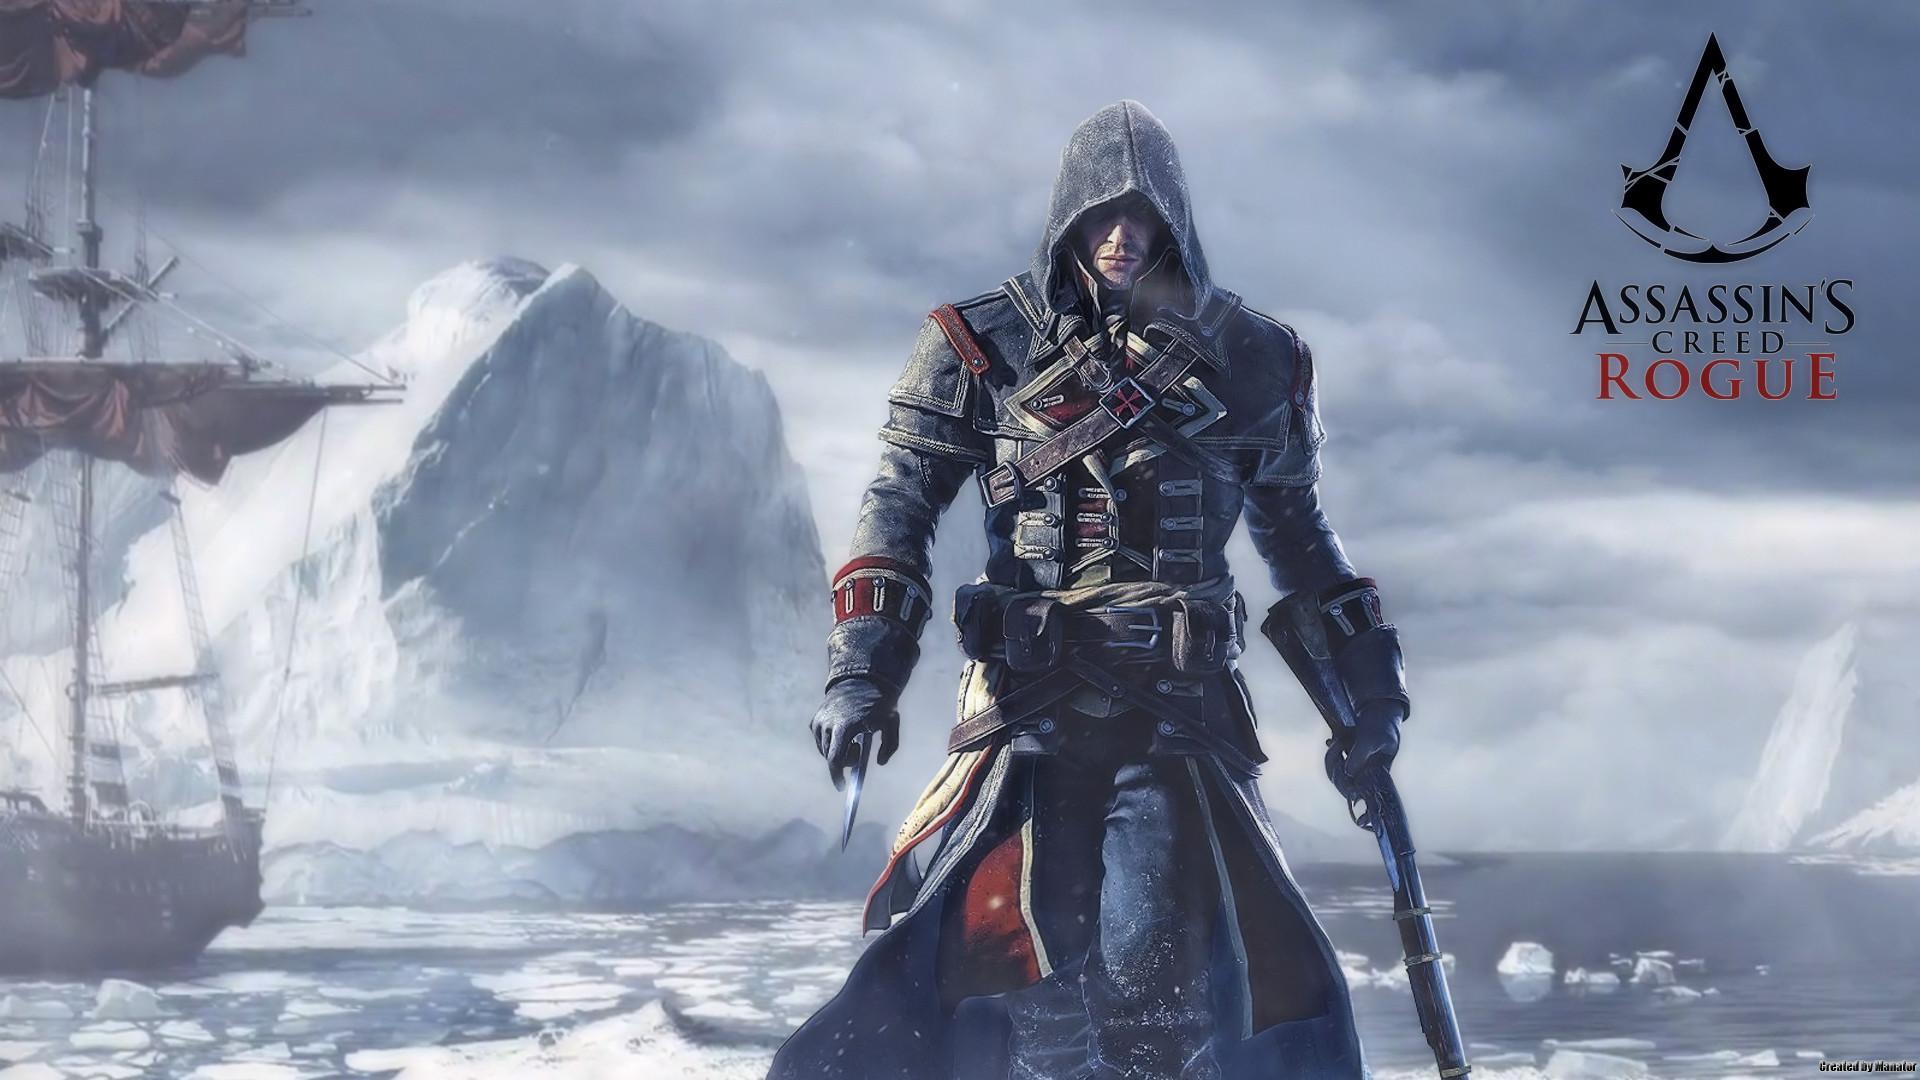 assassins-creed-rogue-logo-wallpaper-2.jpg (1920×1080) | Assassin's Creed |  Pinterest